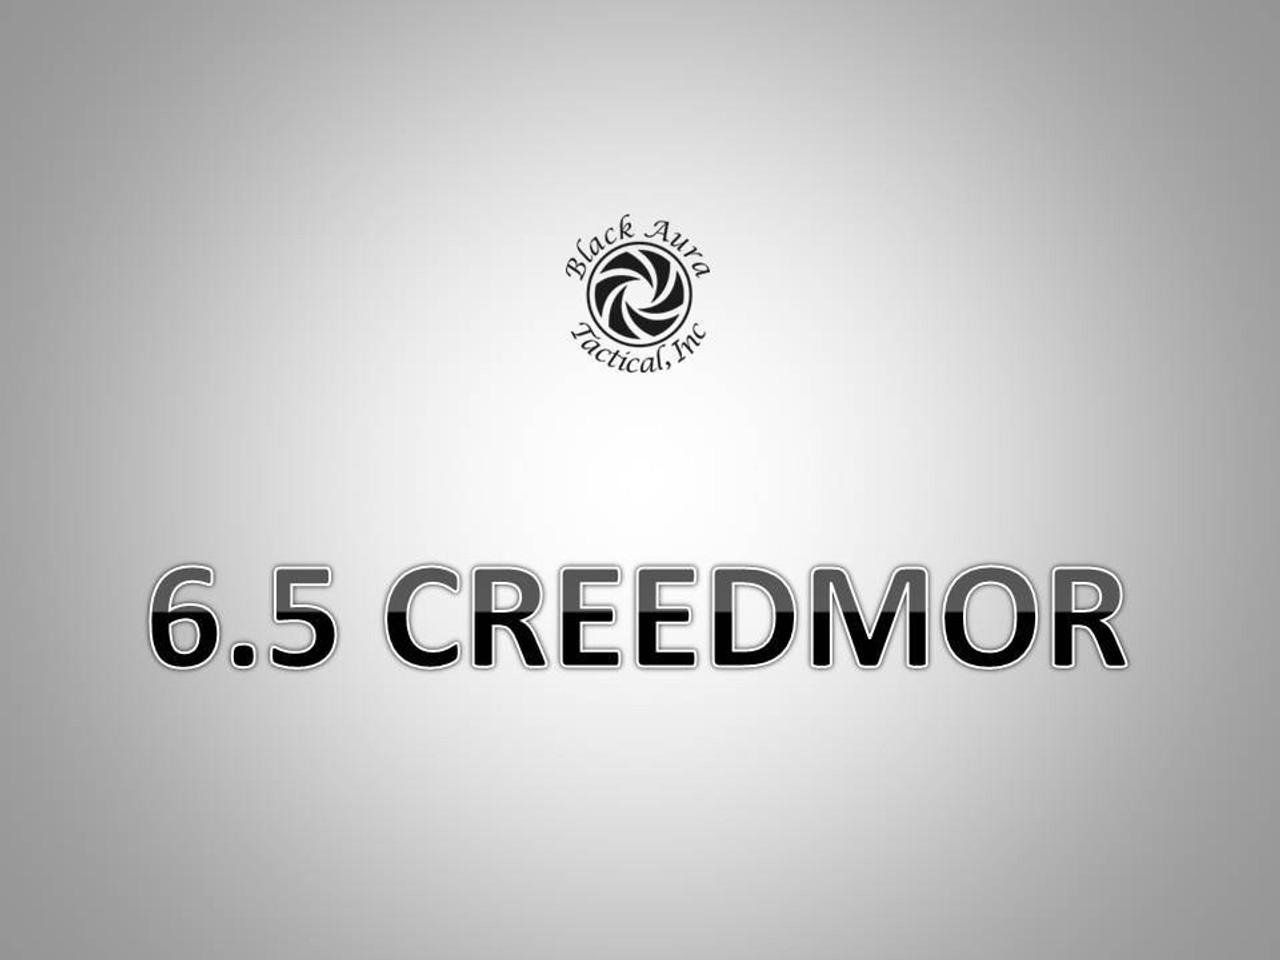 6.5 Creedmor